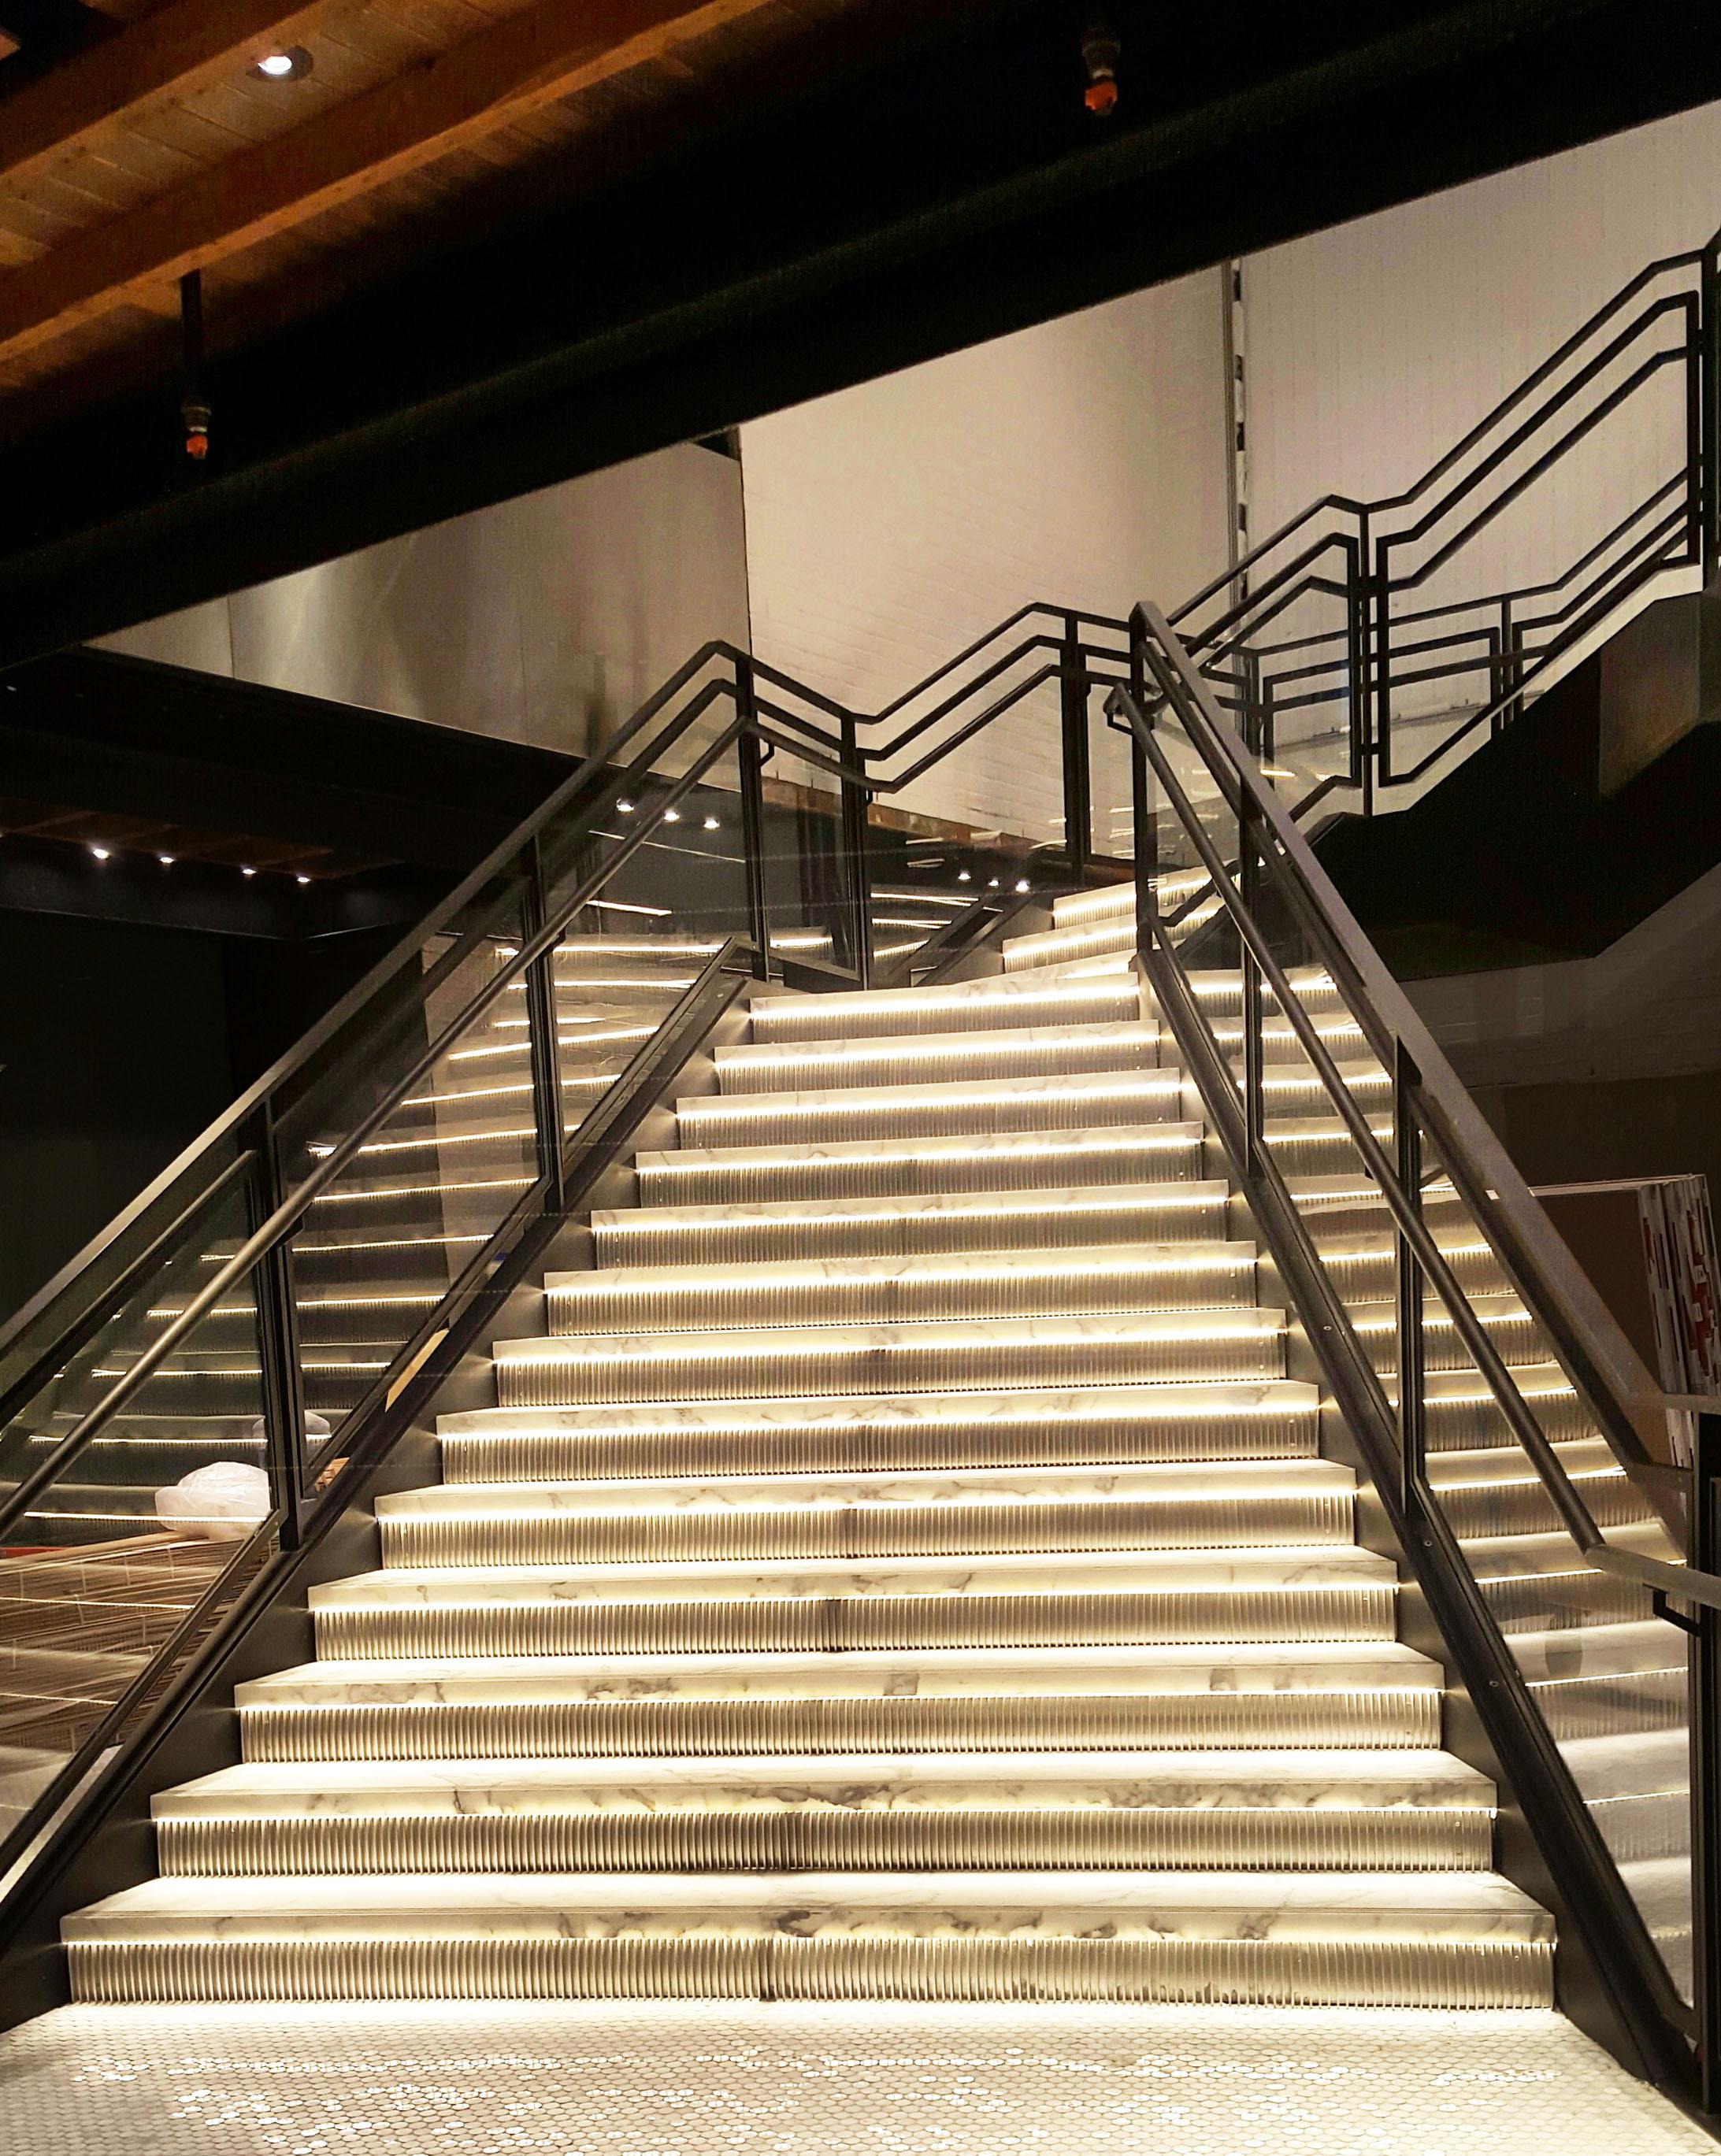 Samsung Stairs 1.jpg